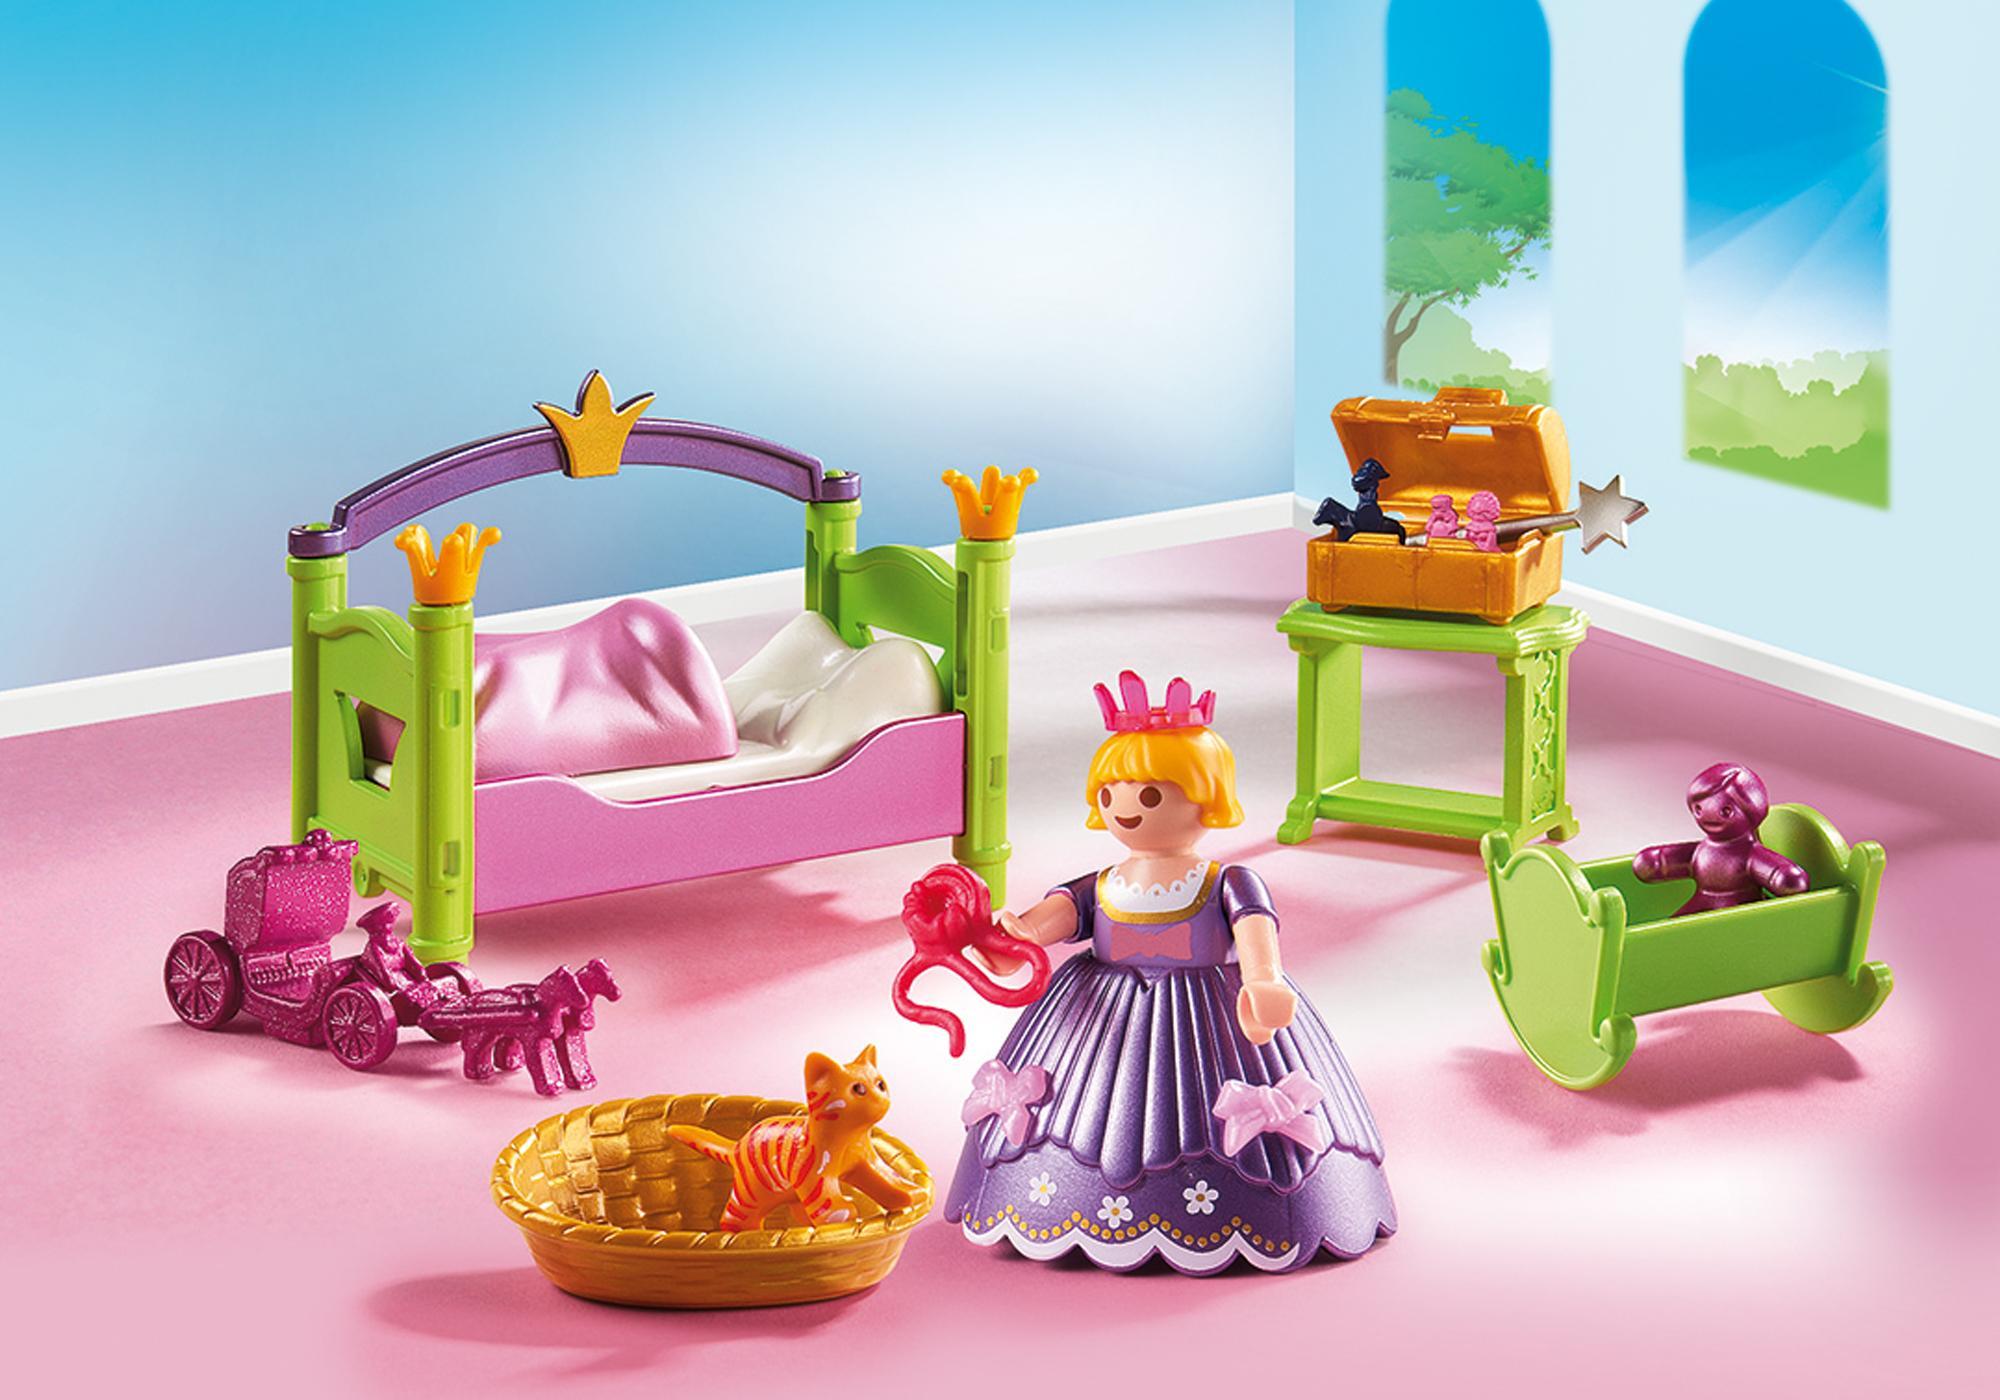 http://media.playmobil.com/i/playmobil/6852_product_detail/Замок Принцессы: Королевская няня